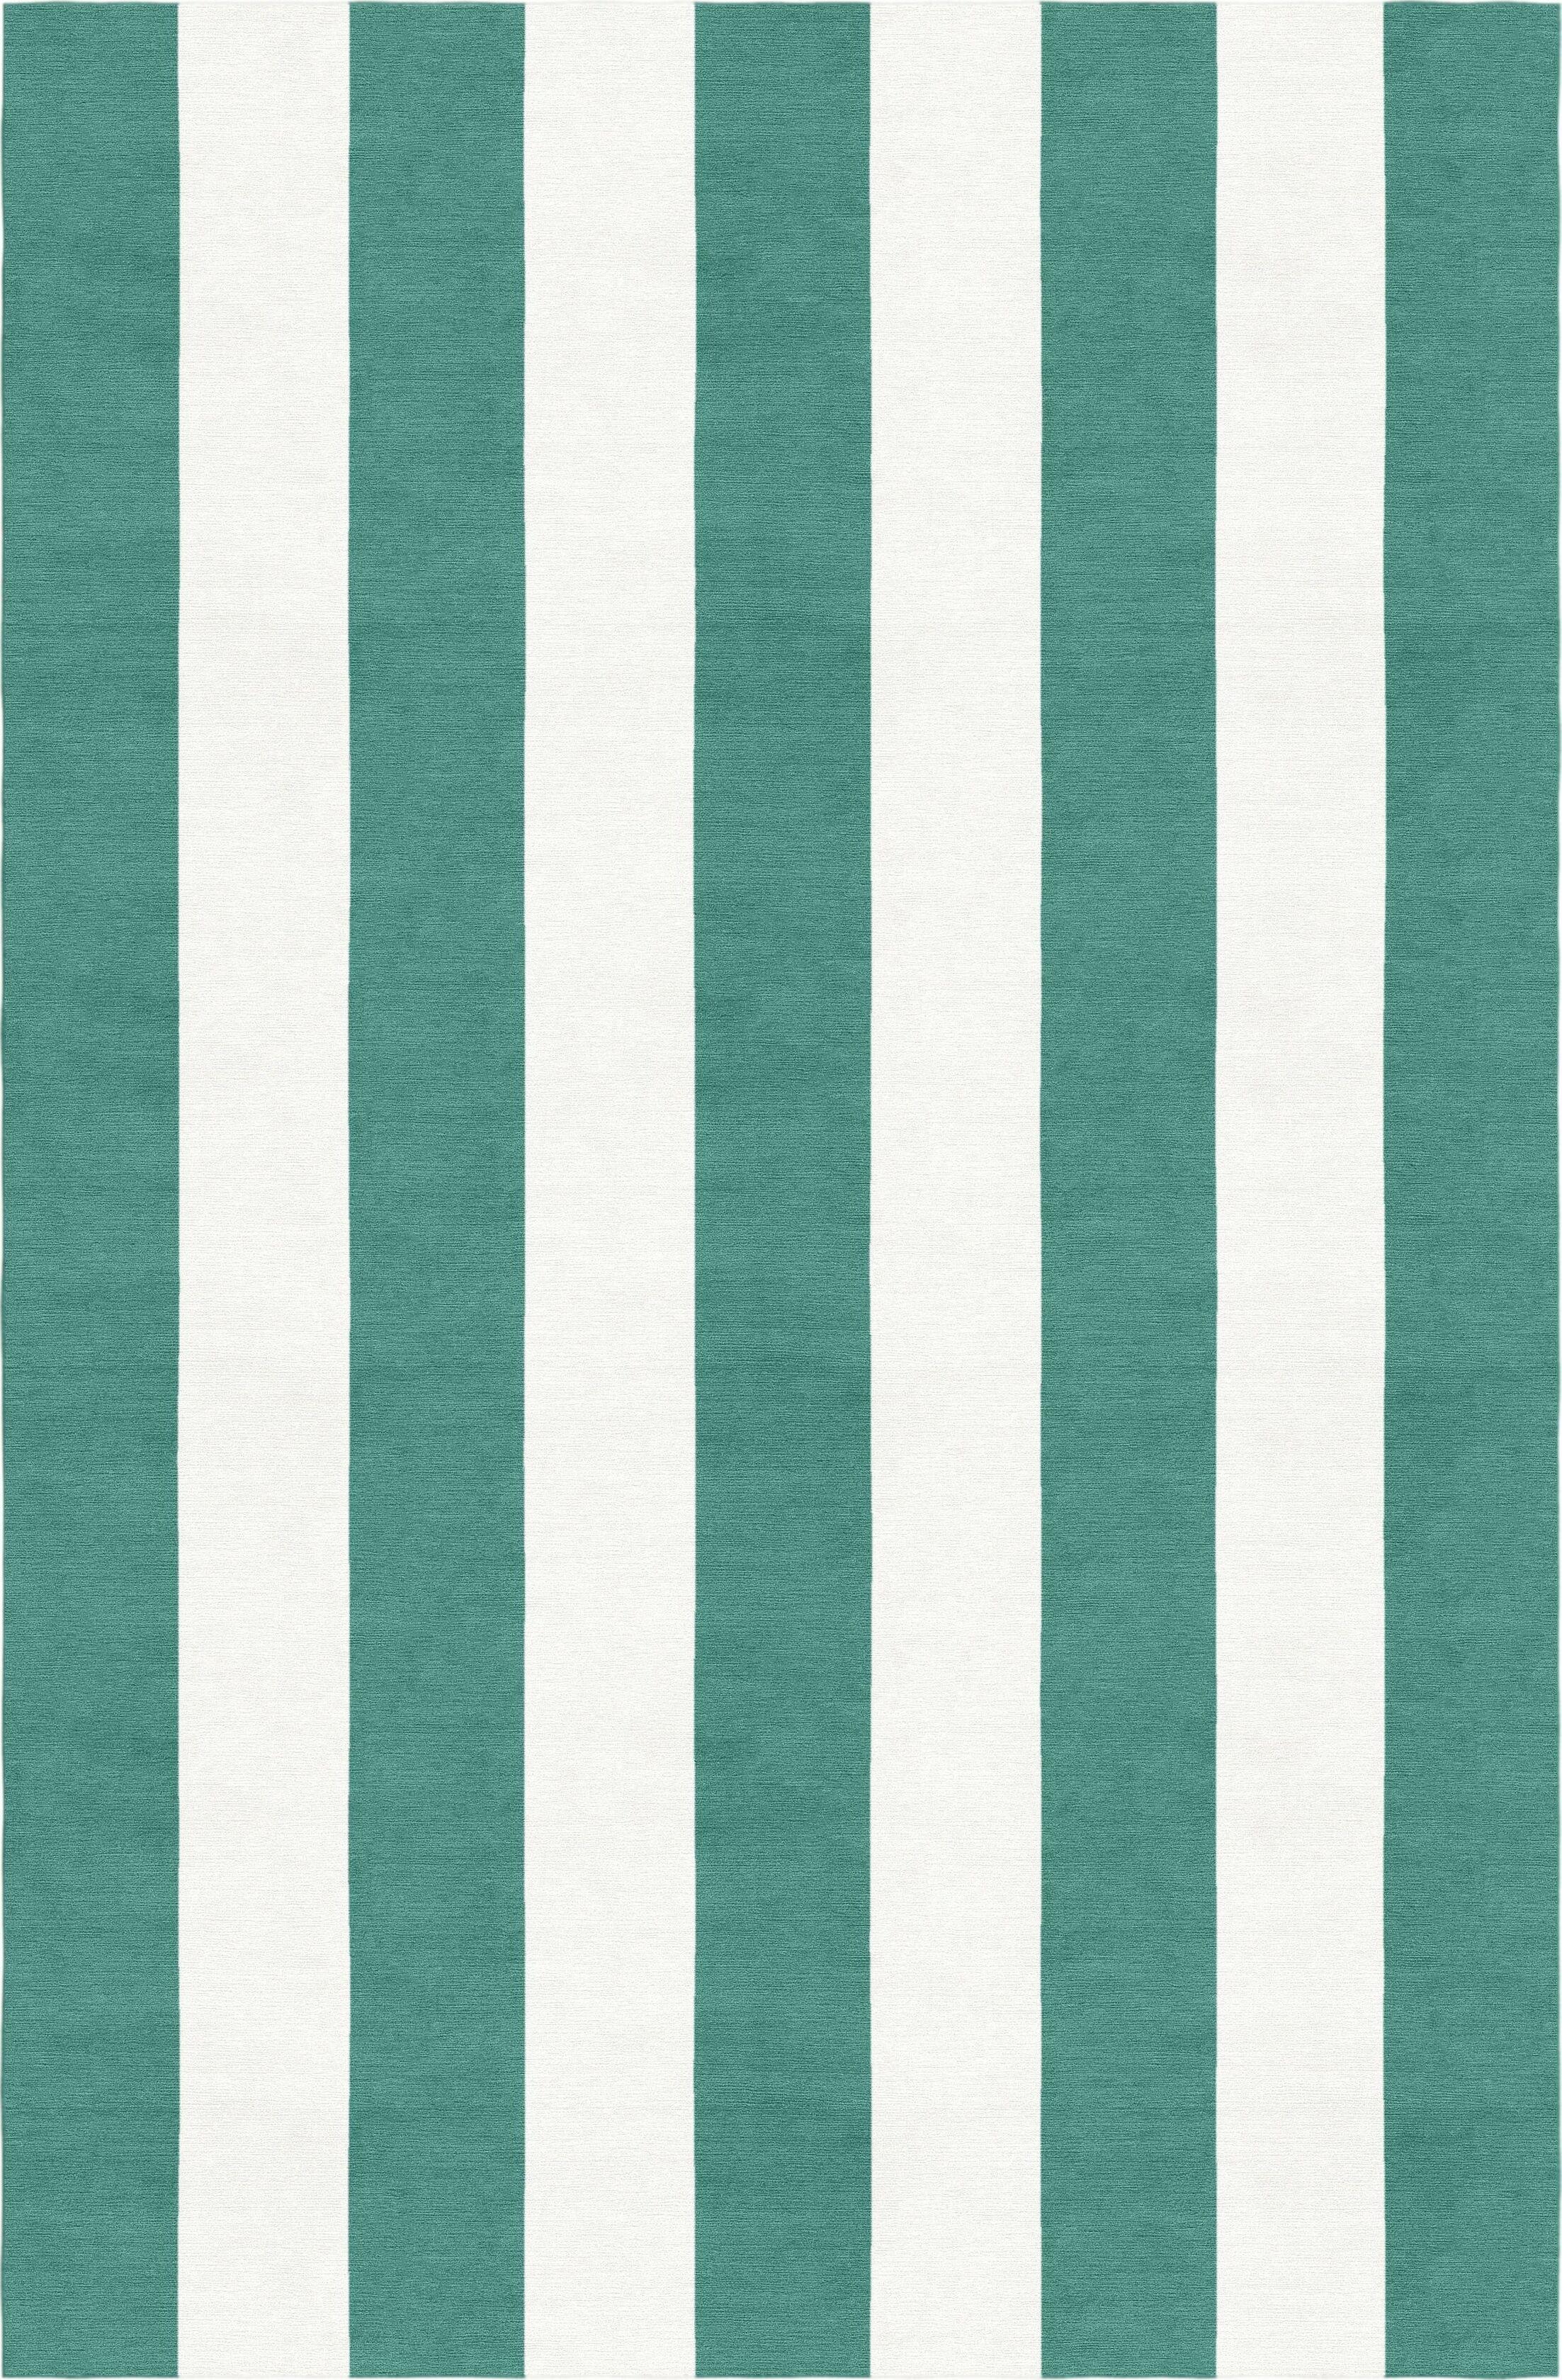 Watkin Stripe Hand-Woven Wool Teal/White Area Rug Rug Size: Rectangle 5' x 8'